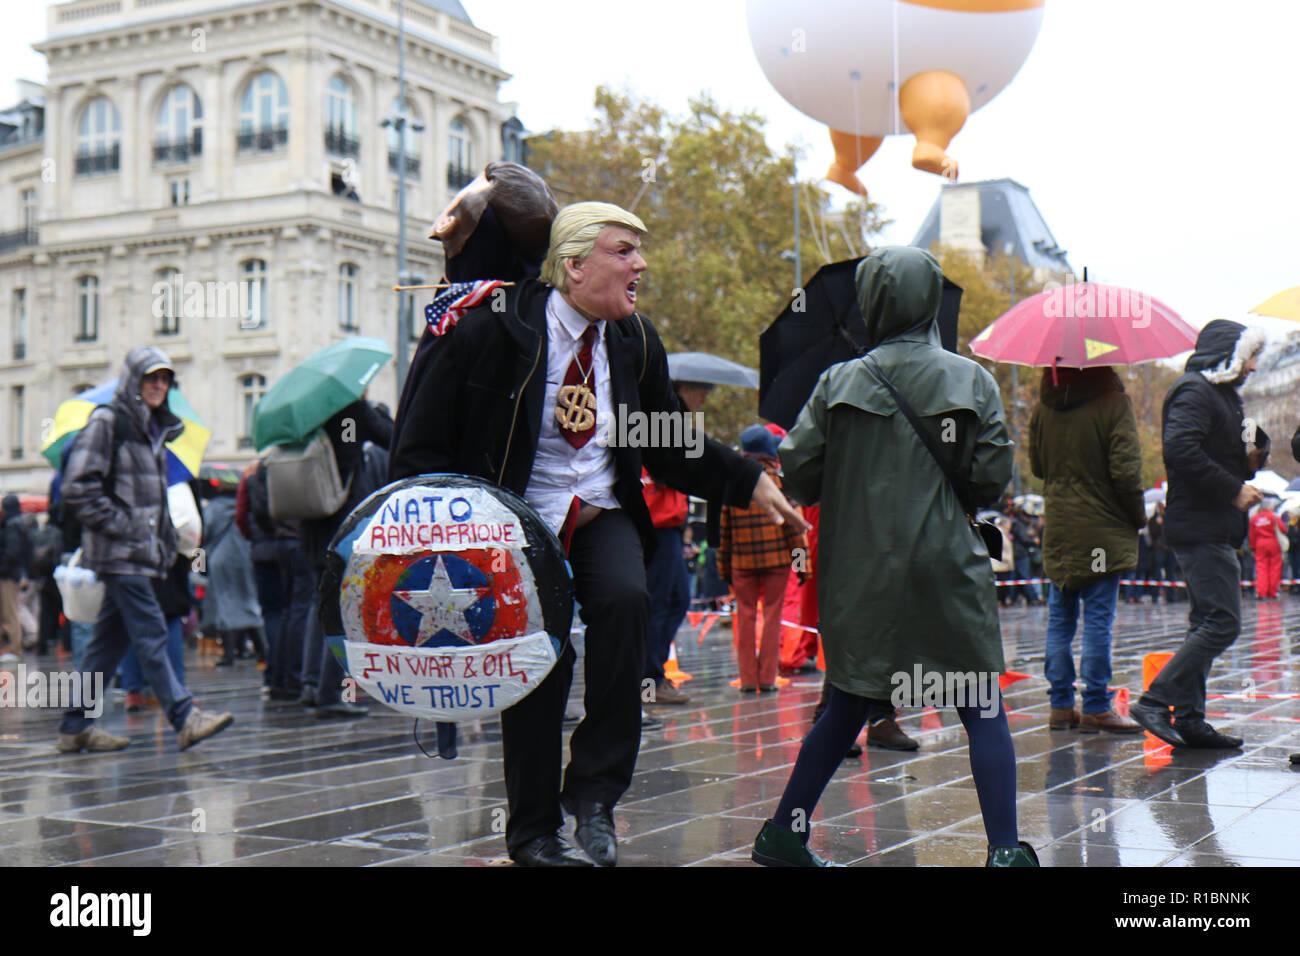 Paris, France. 11th Nov 2018.11 Nov 2018, Paris, France - A demonstrator in a Trump mask engages with others at Place de la République in Paris during an anti-Trump demonstration. Credit: Justin S. Johnson/Alamy Live News - Stock Image